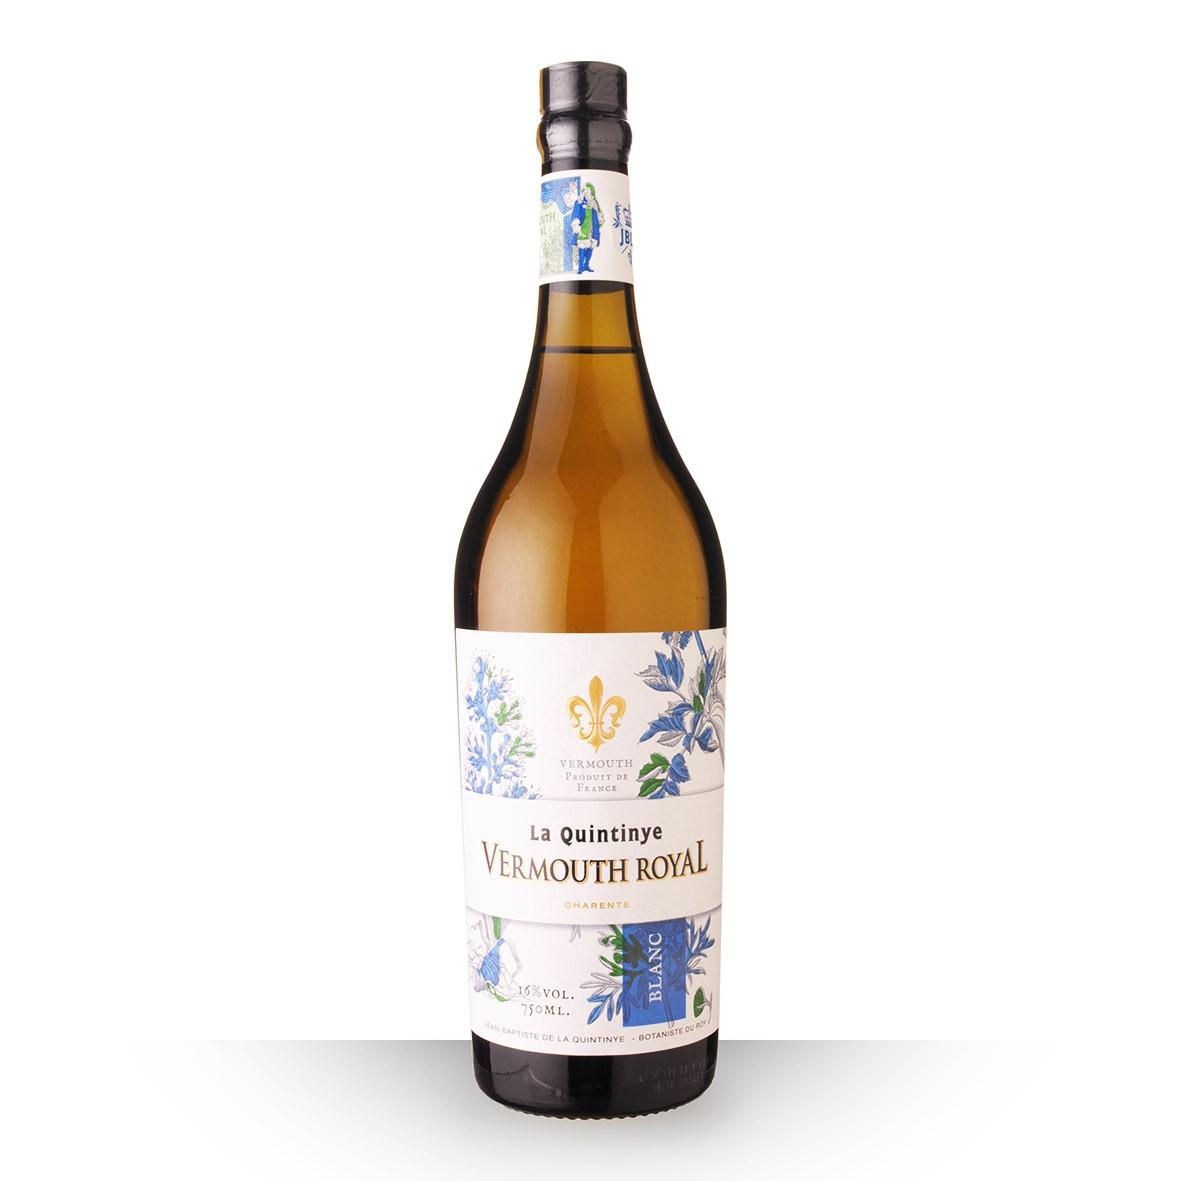 Vermouth La Quintinye Vermouth Royal Blanc 75cl www.odyssee-vins.com